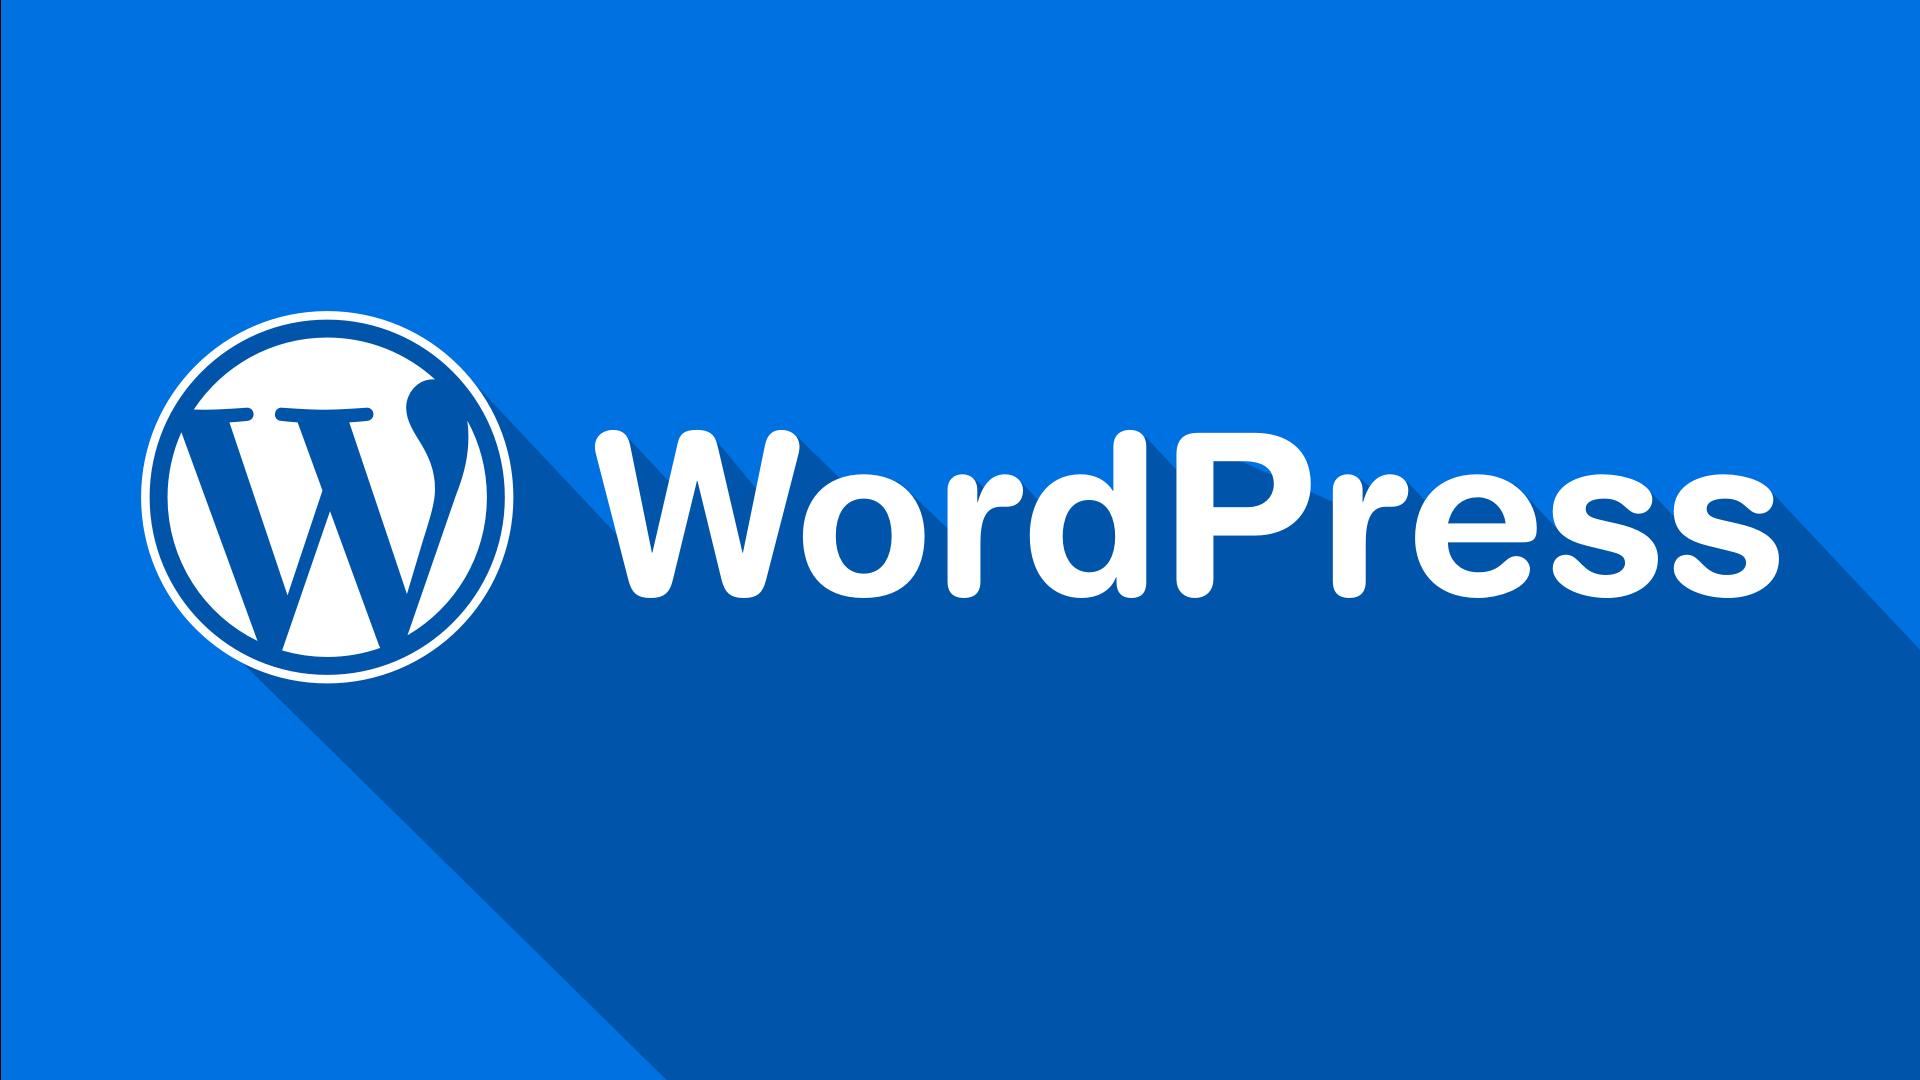 wordpress logo desktop wallpaper 74193